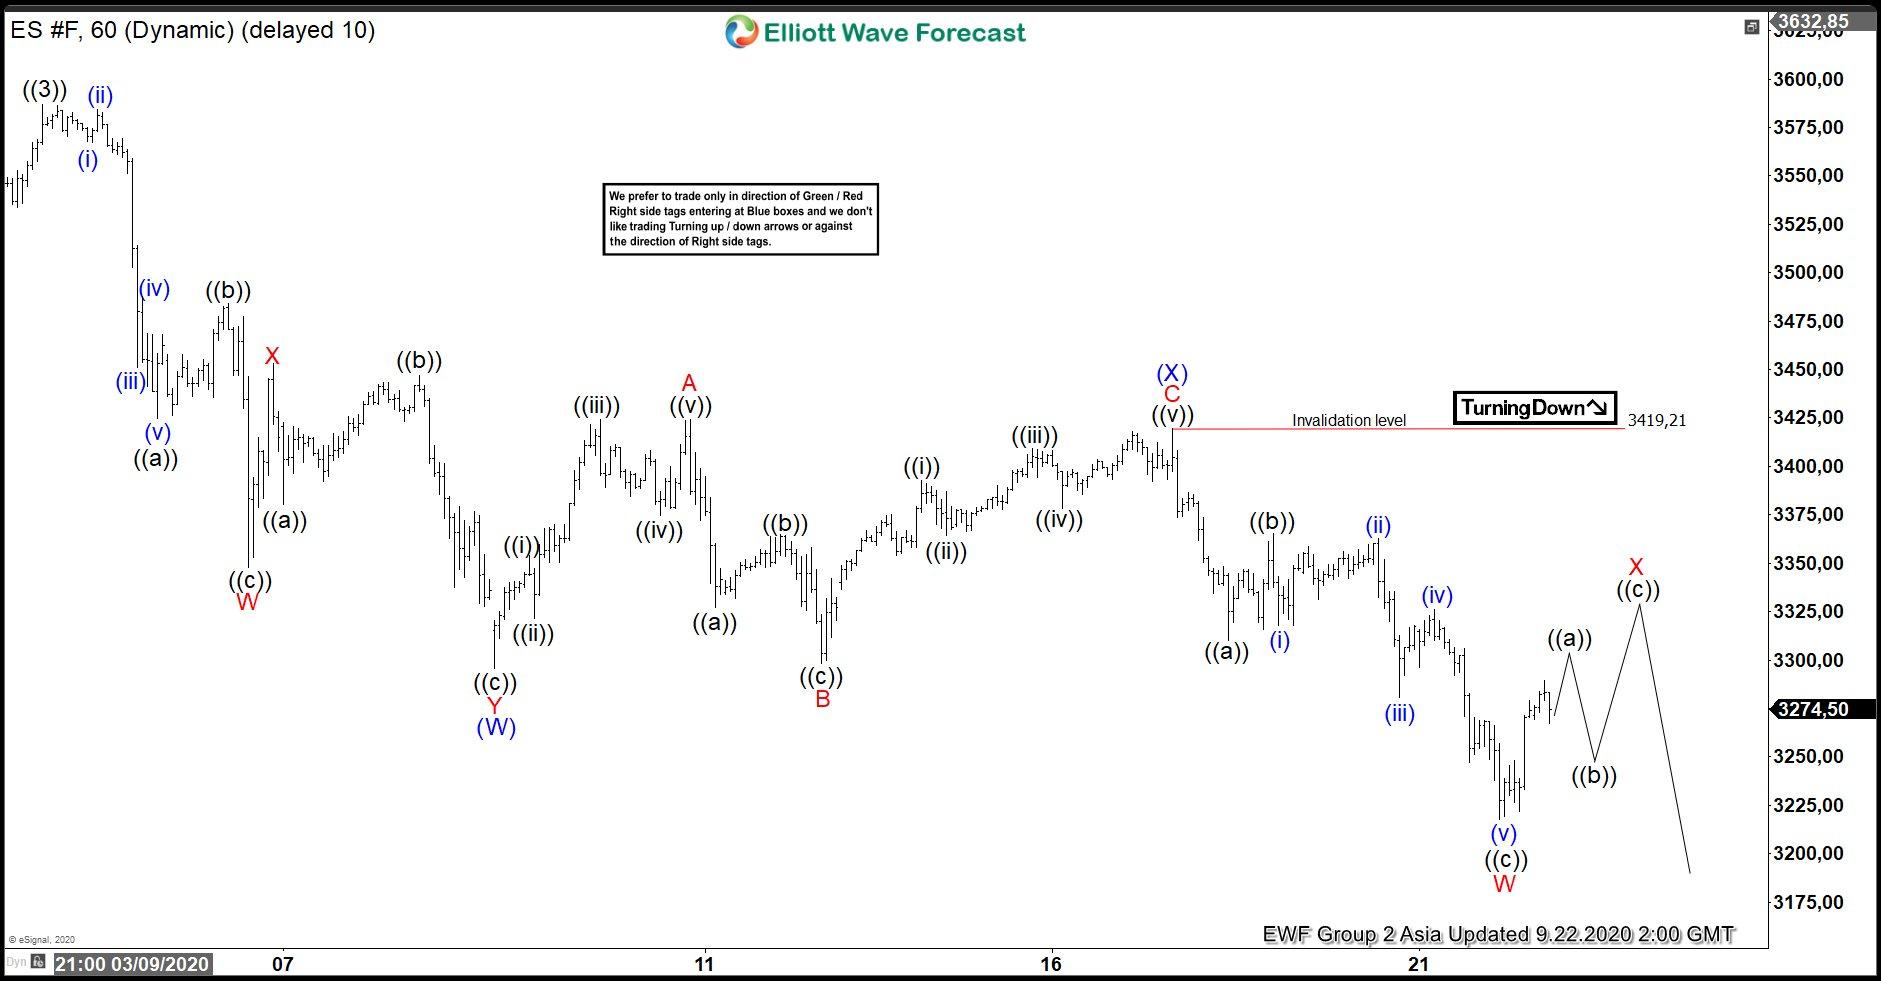 Elliott Wave View: S&P 500 E mini Futures (ES) Correction In Progress